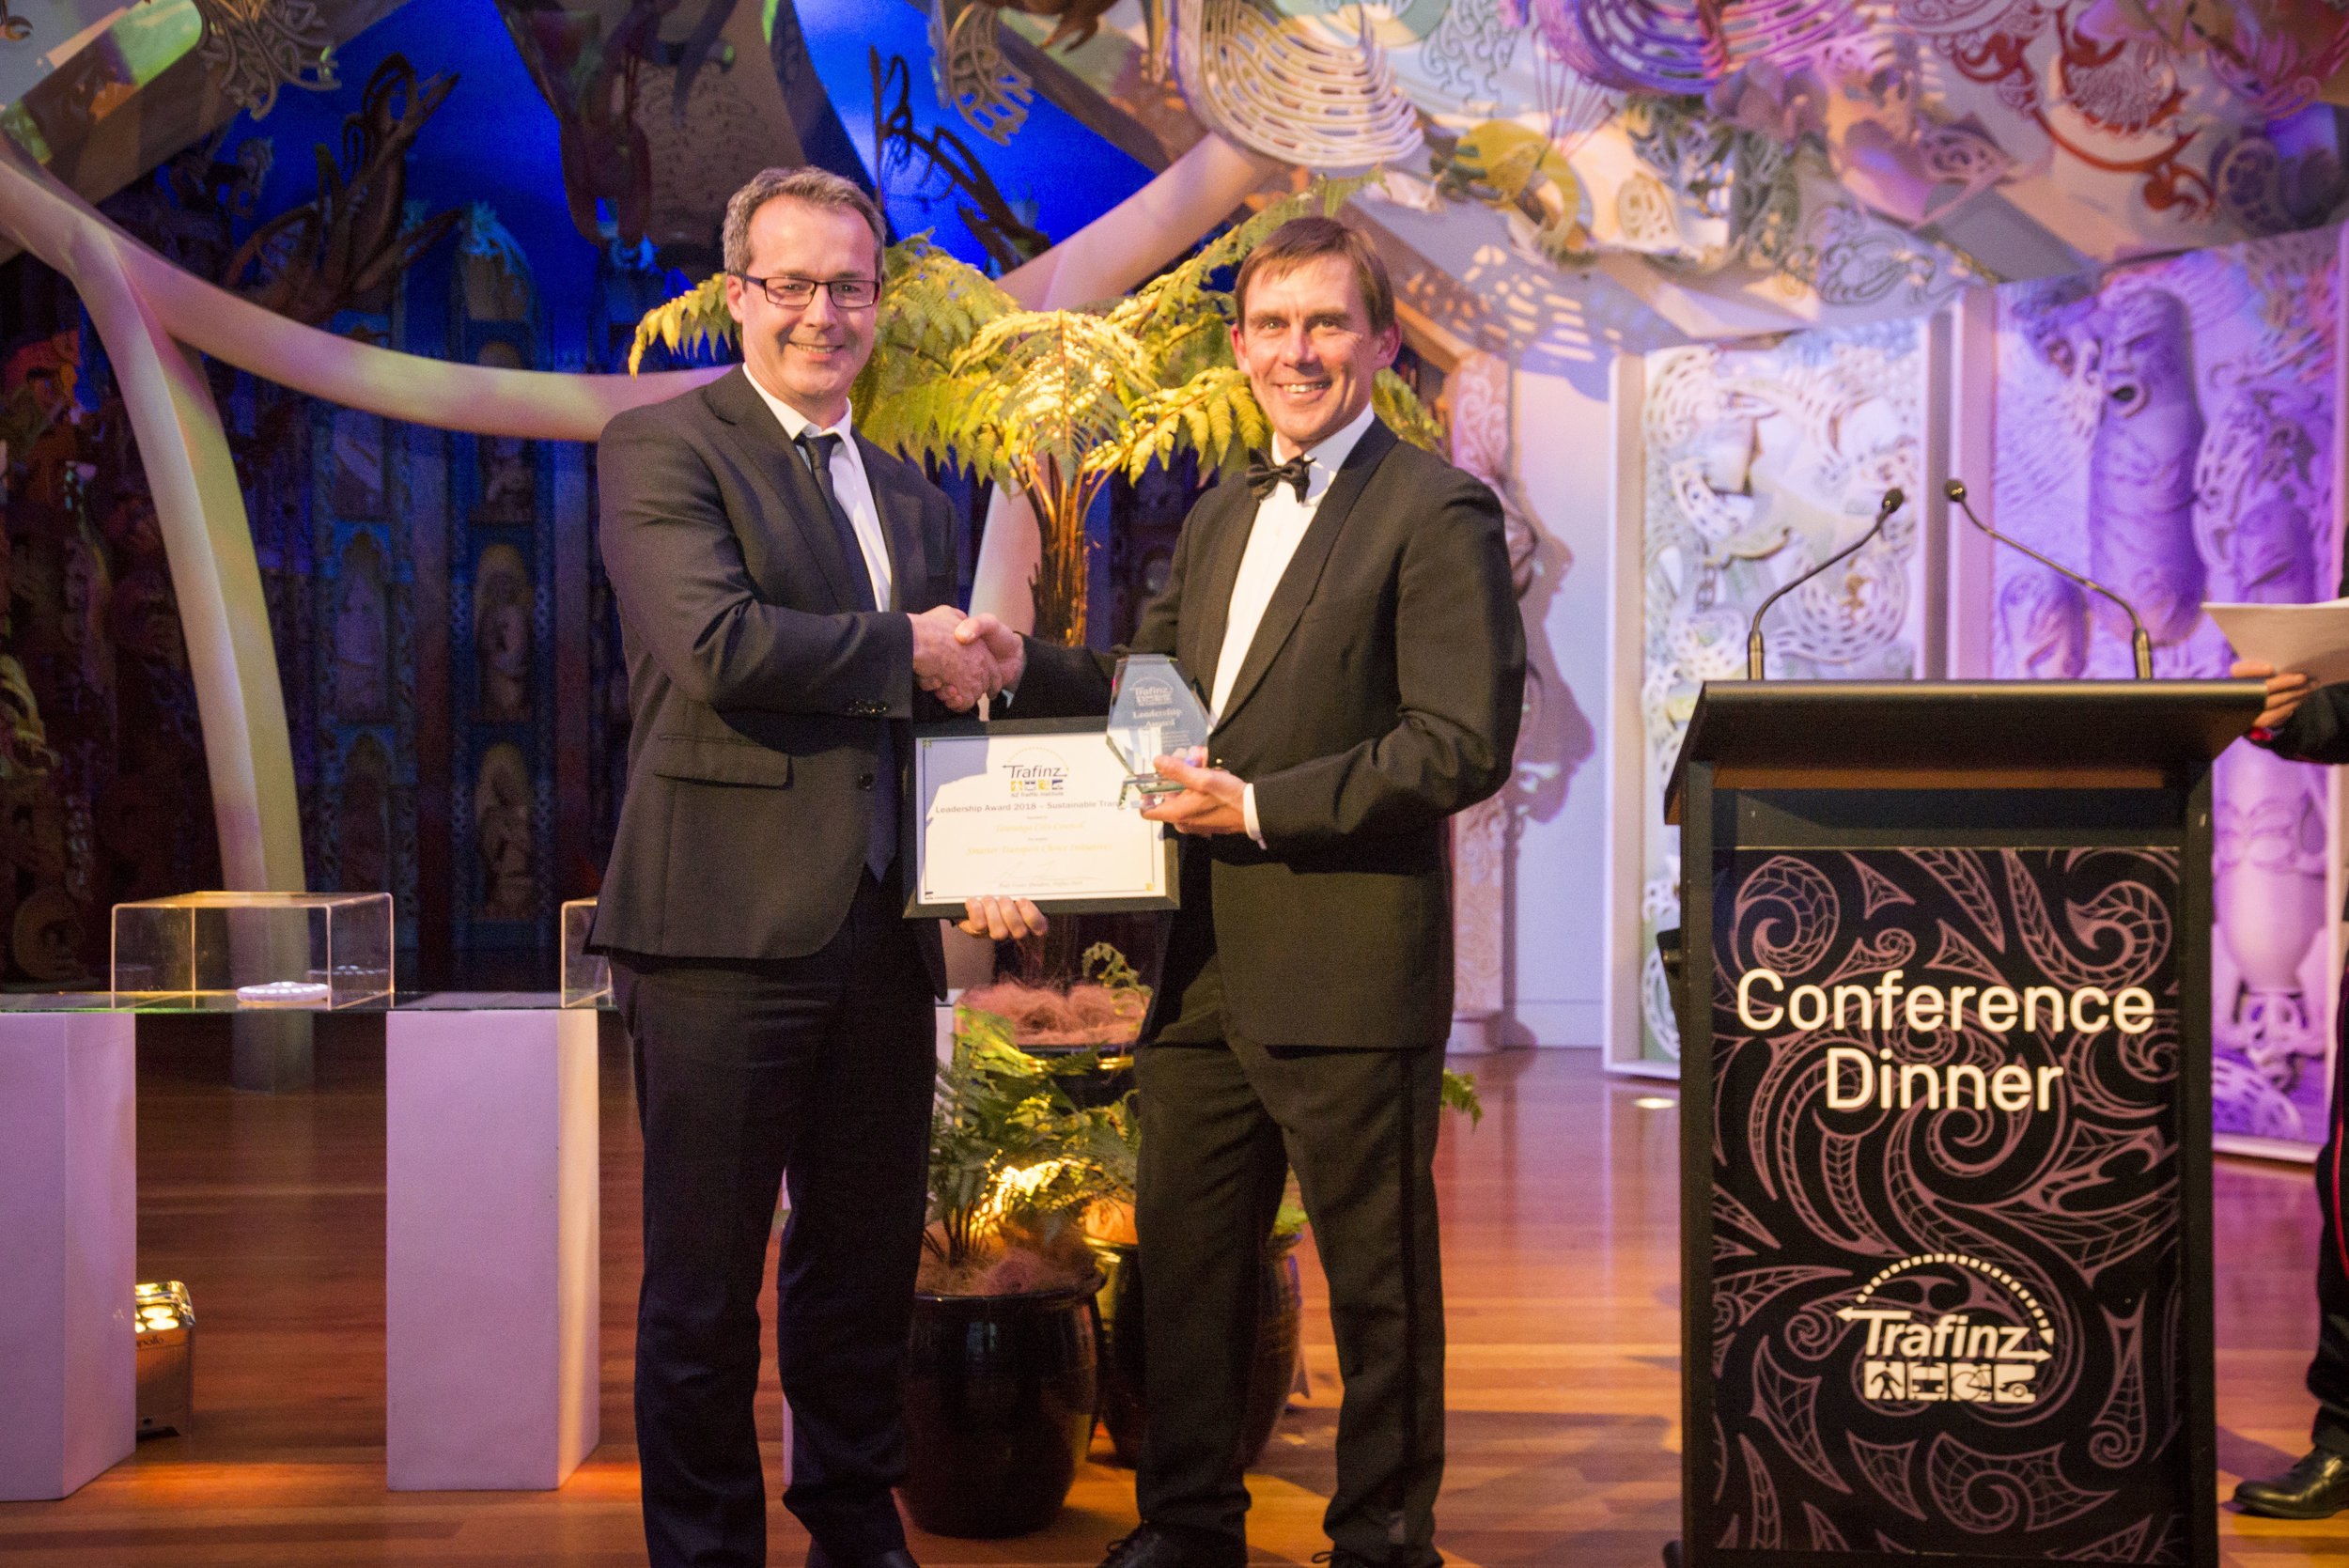 Sustainable Transport Leadership Award - Smarter Transport Choice Initiatives, Tauranga City Council